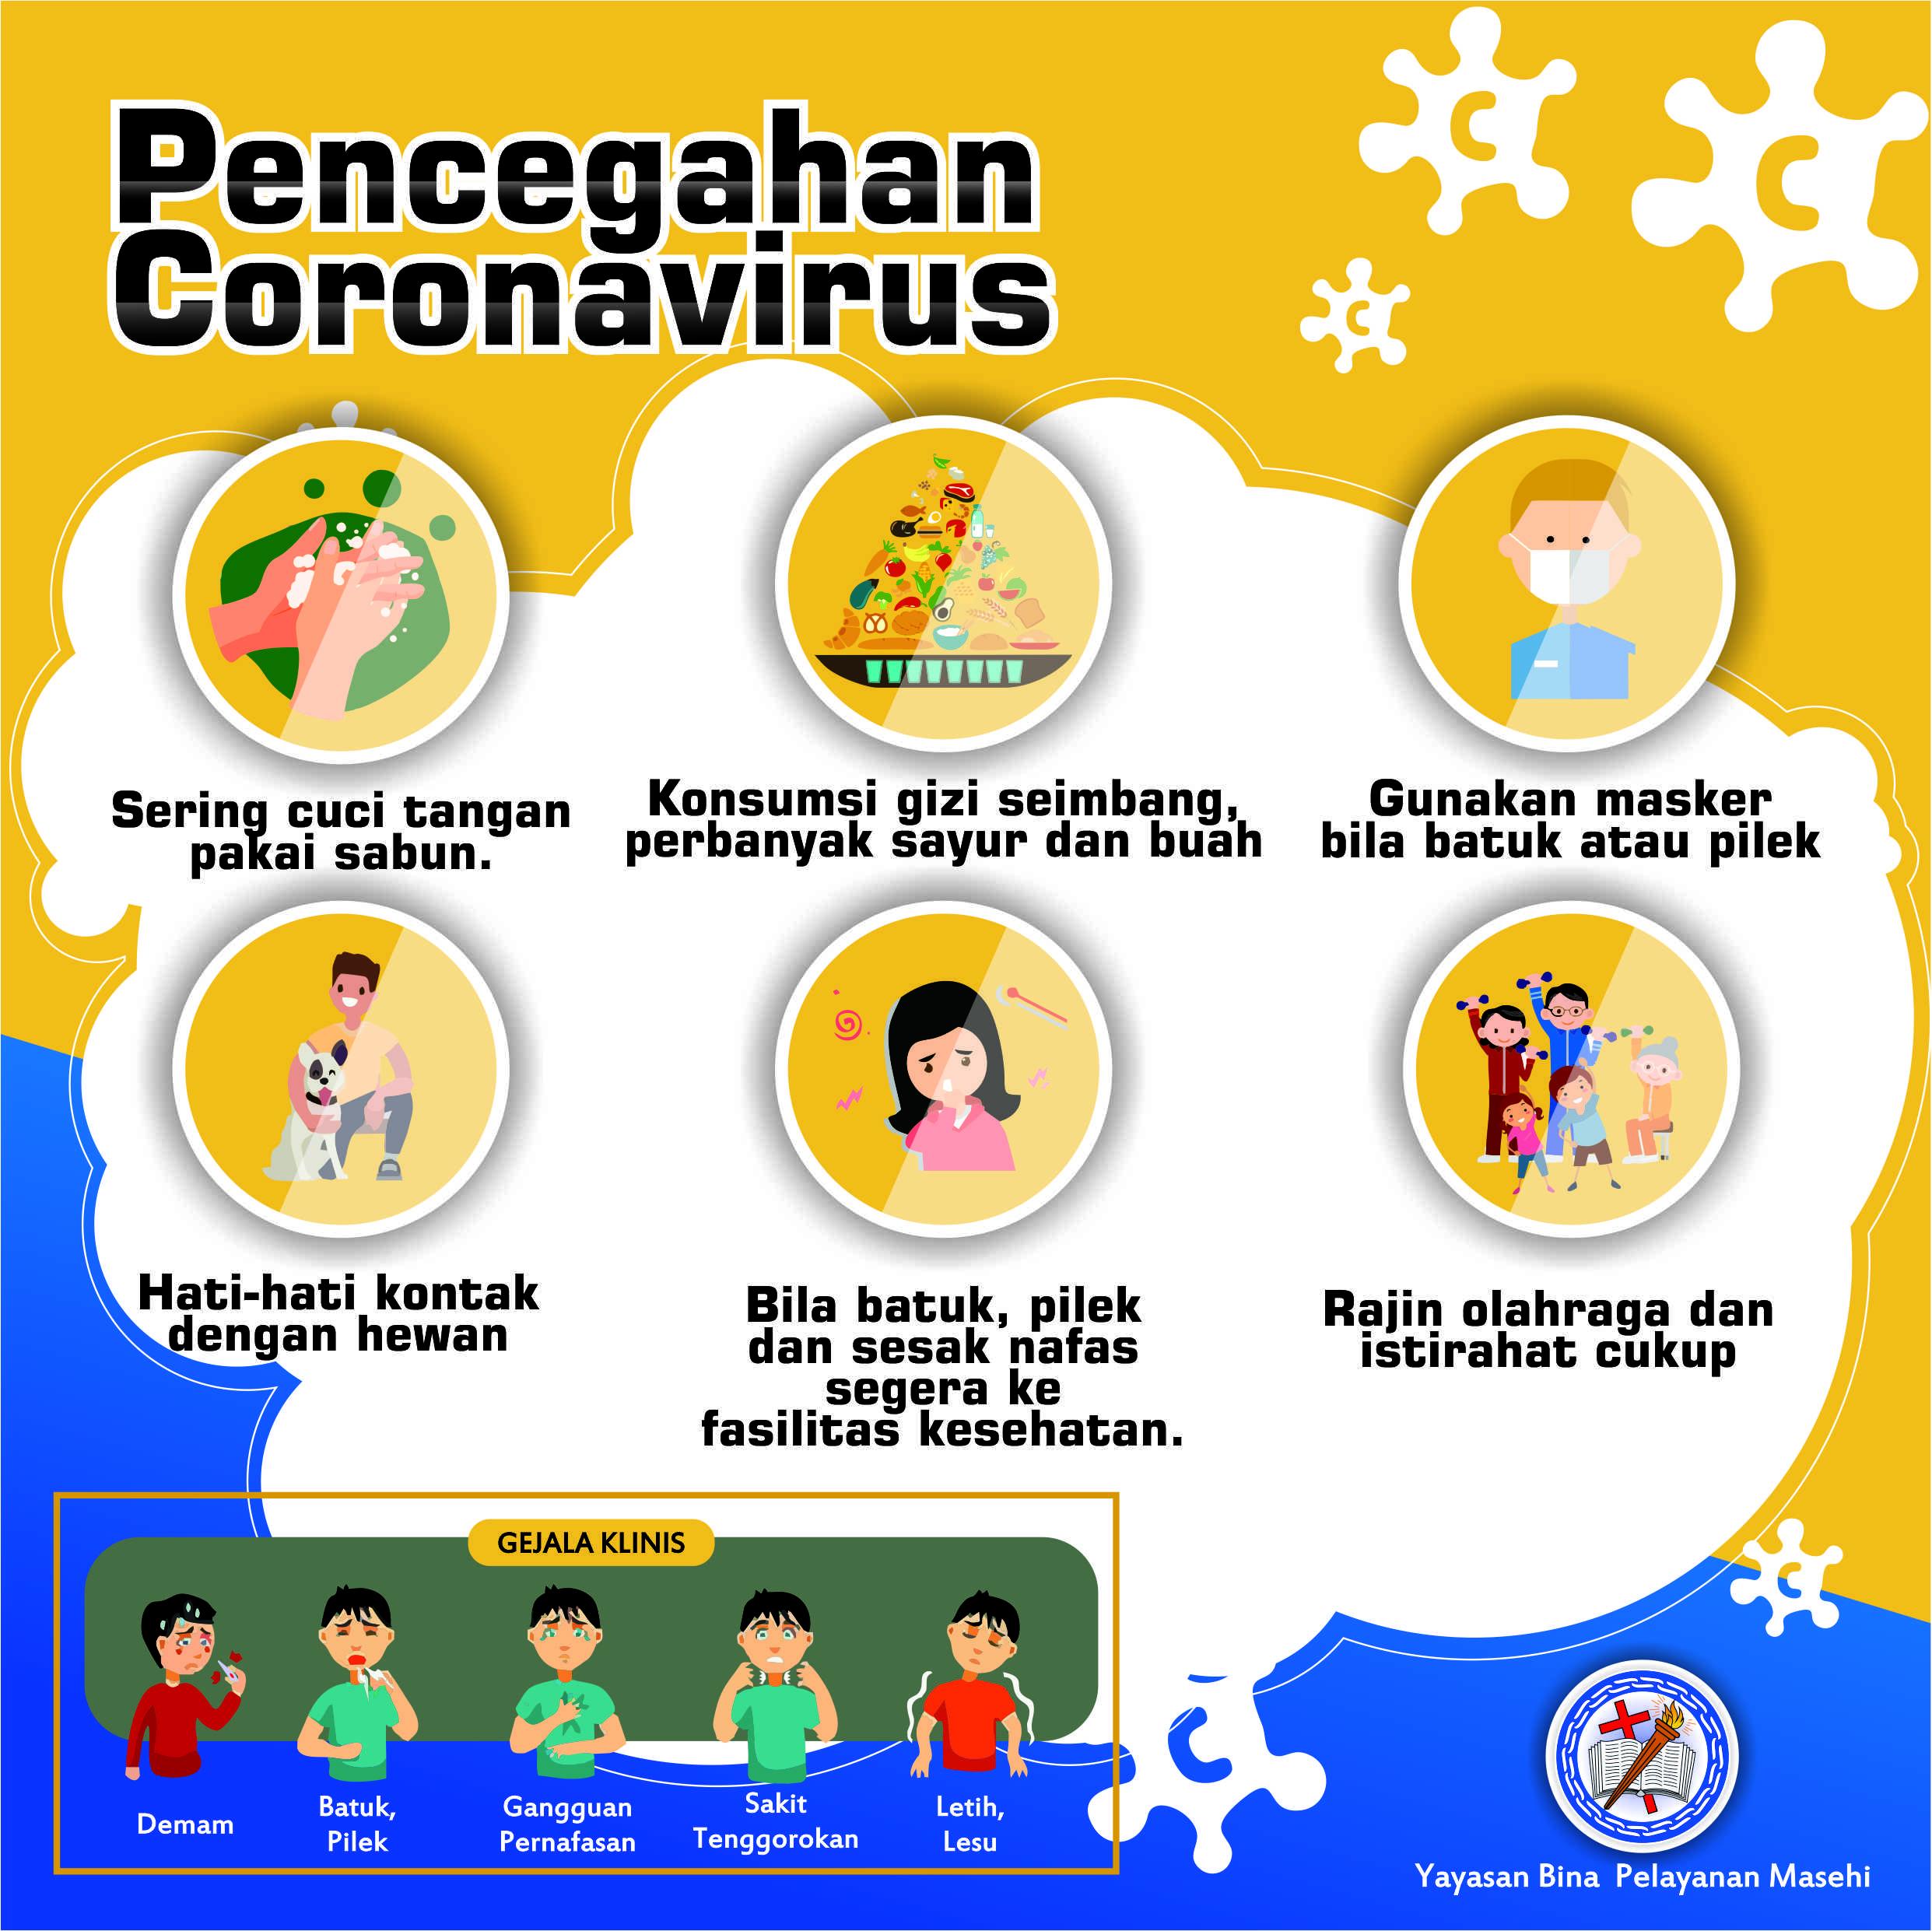 Pencegahan Pandemi COVID-19